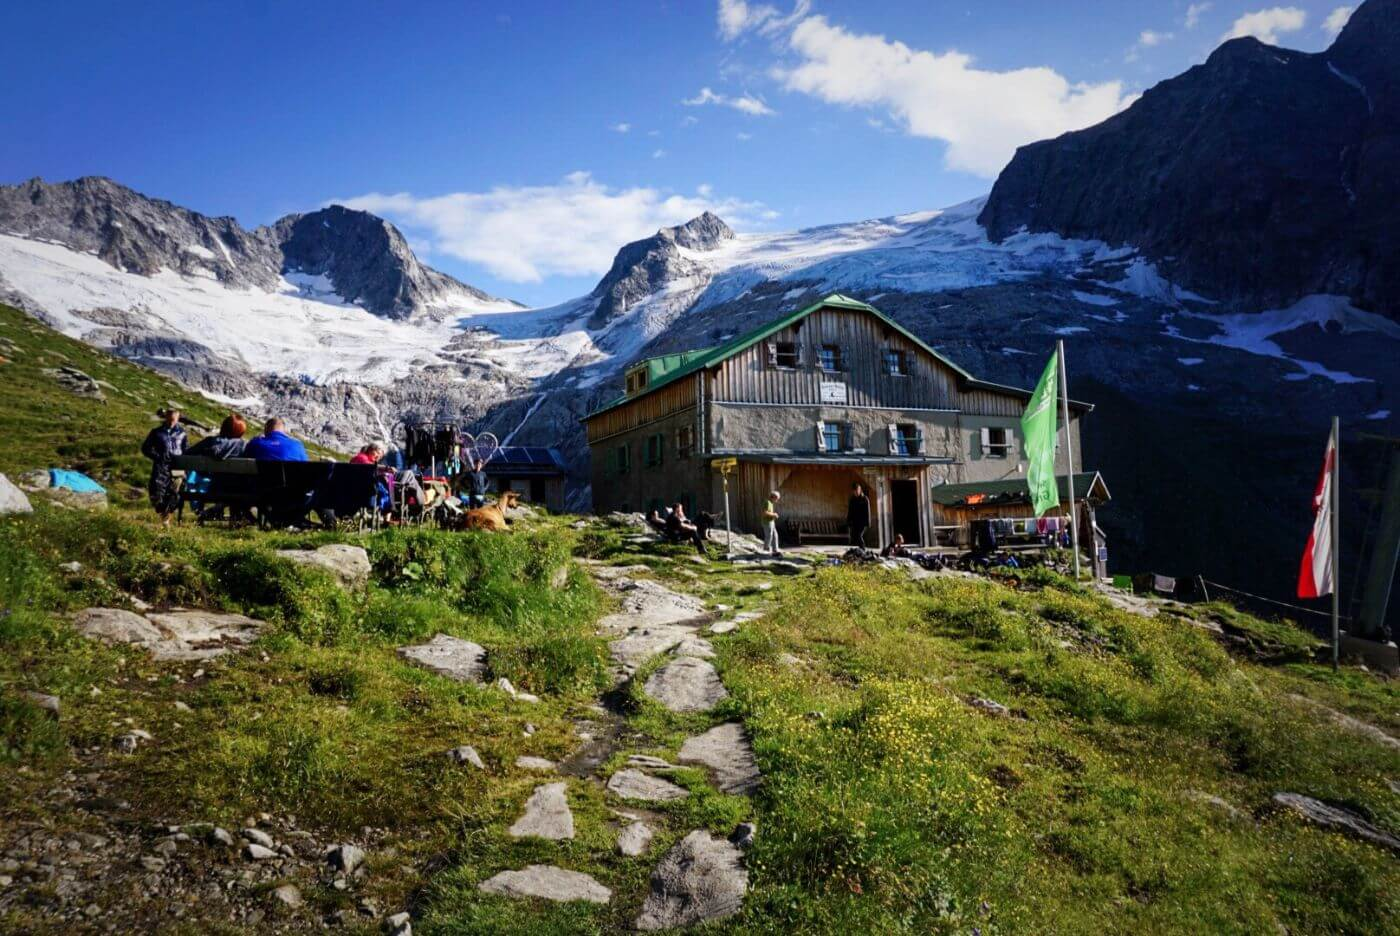 Greizer Hut, Berlin High Trail Hiking Guide (Berliner Höhenweg) - Austrian Alps hut to hut hike